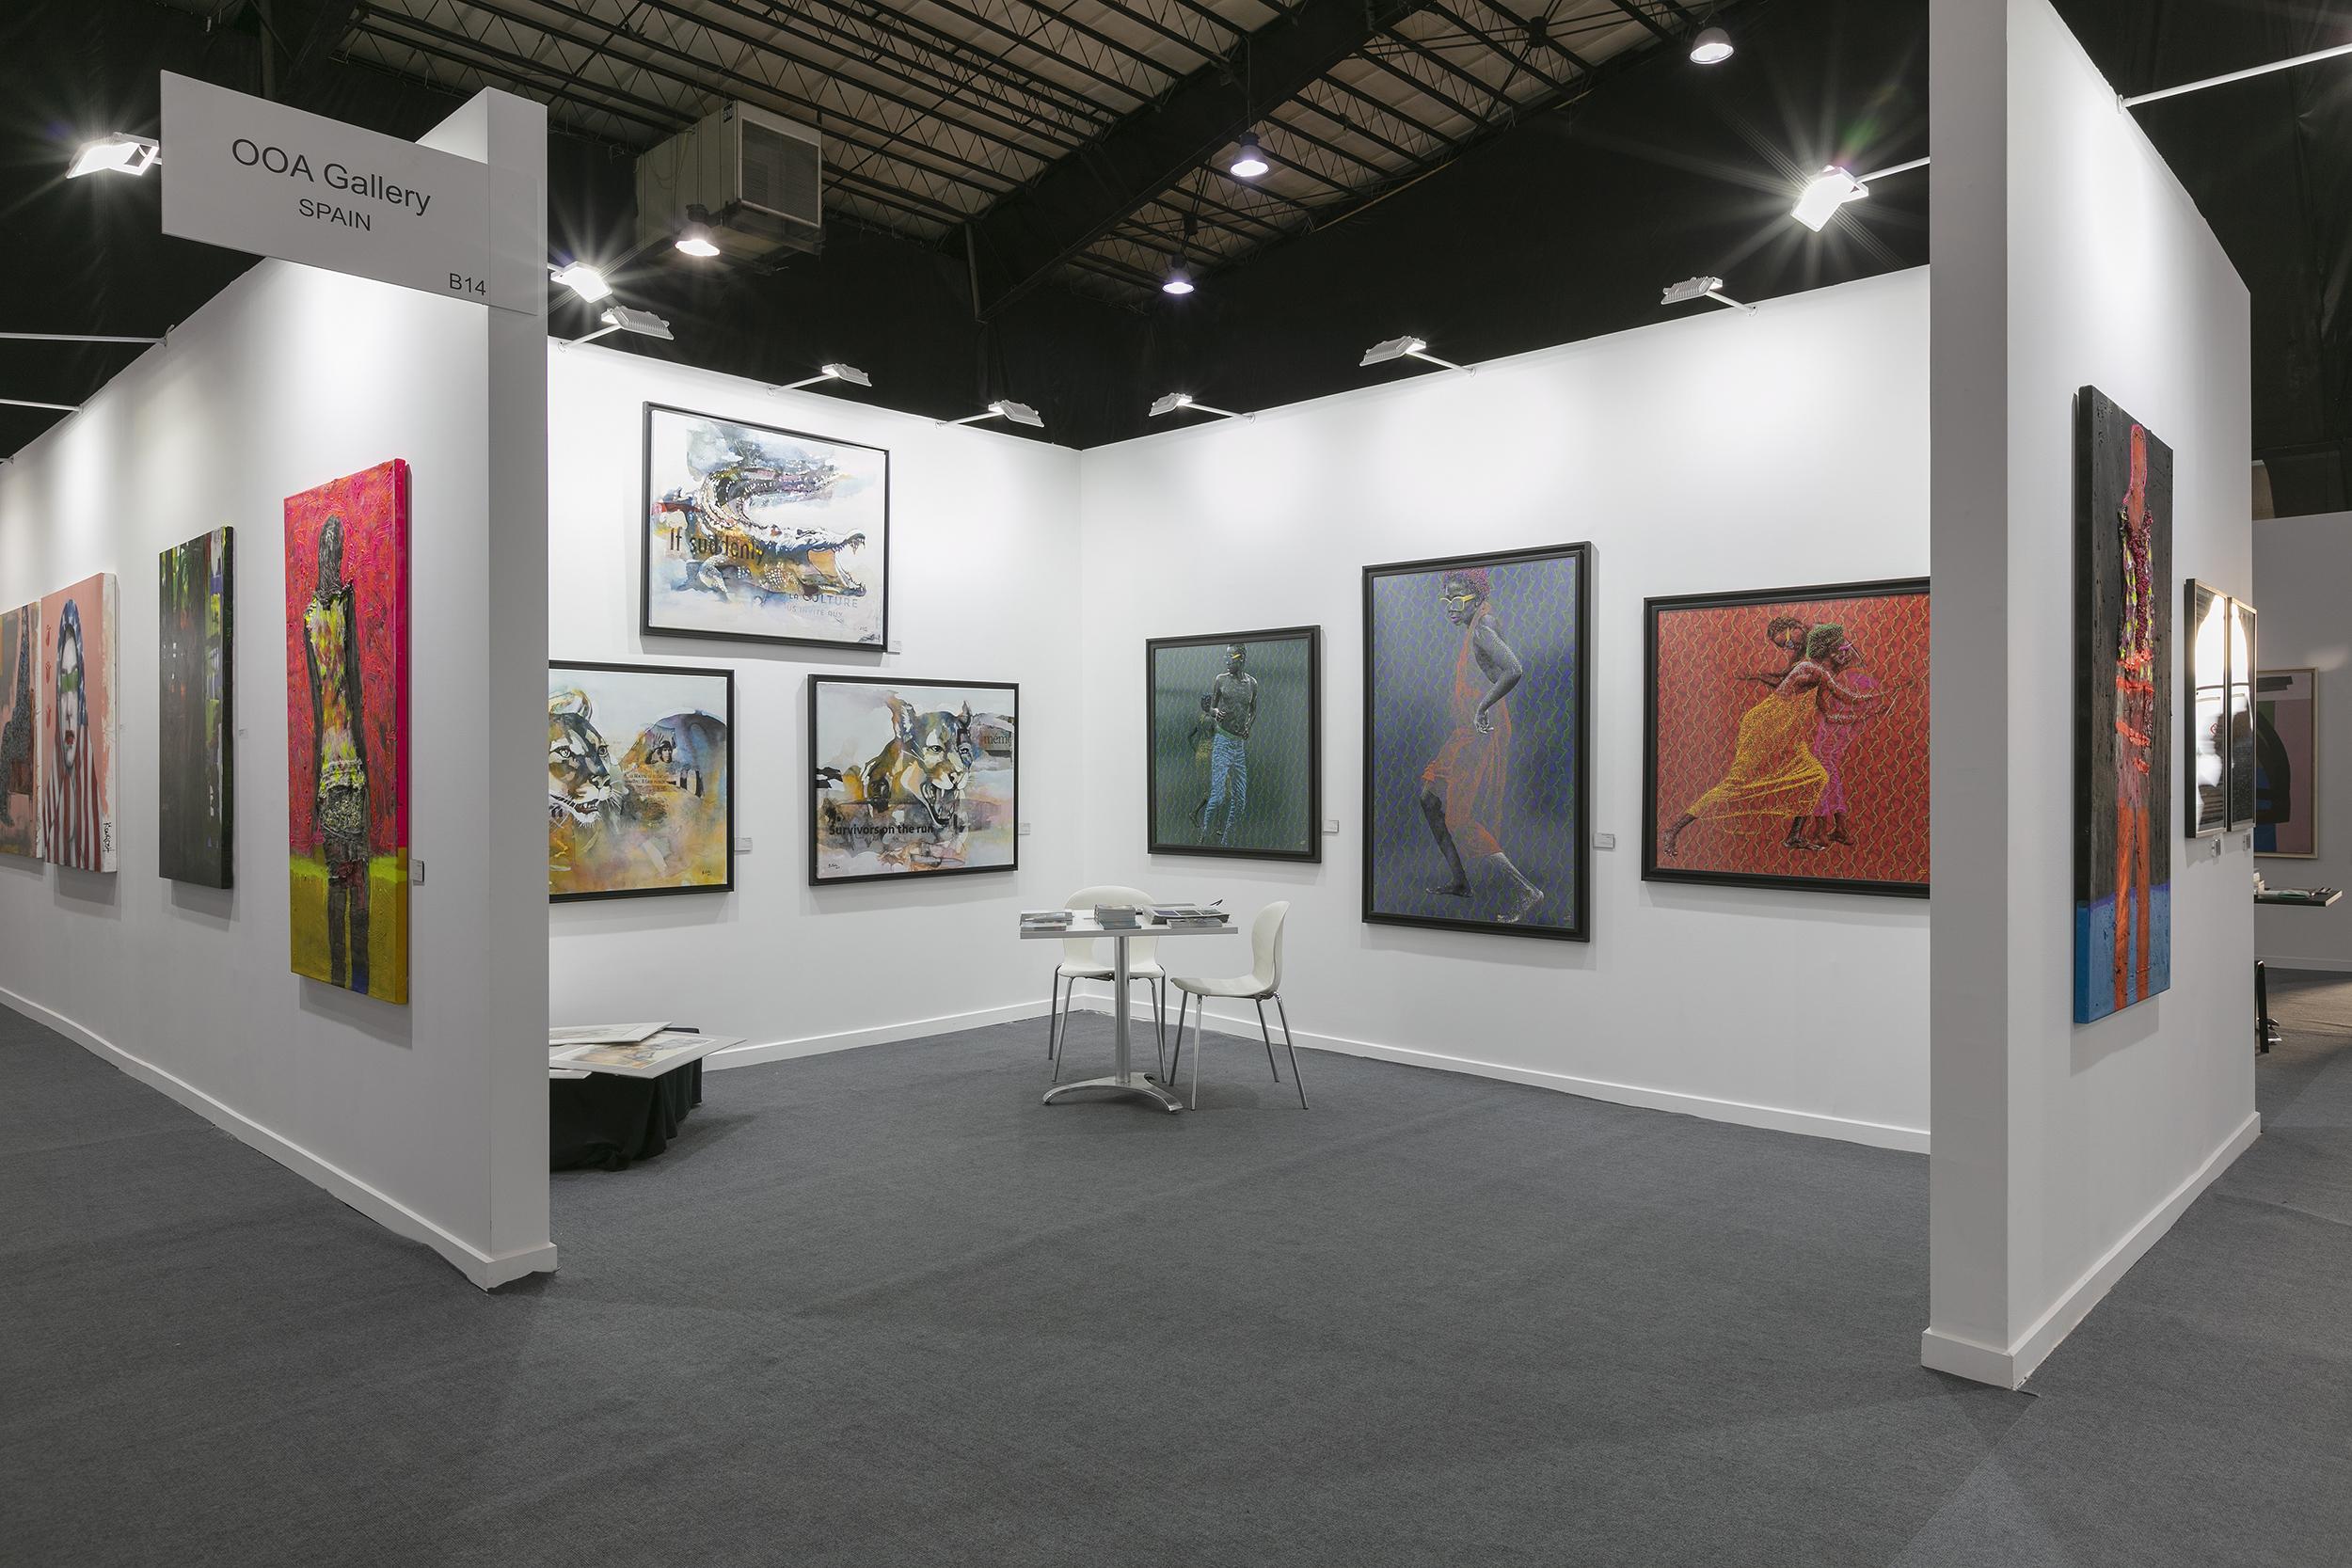 OOA Gallery